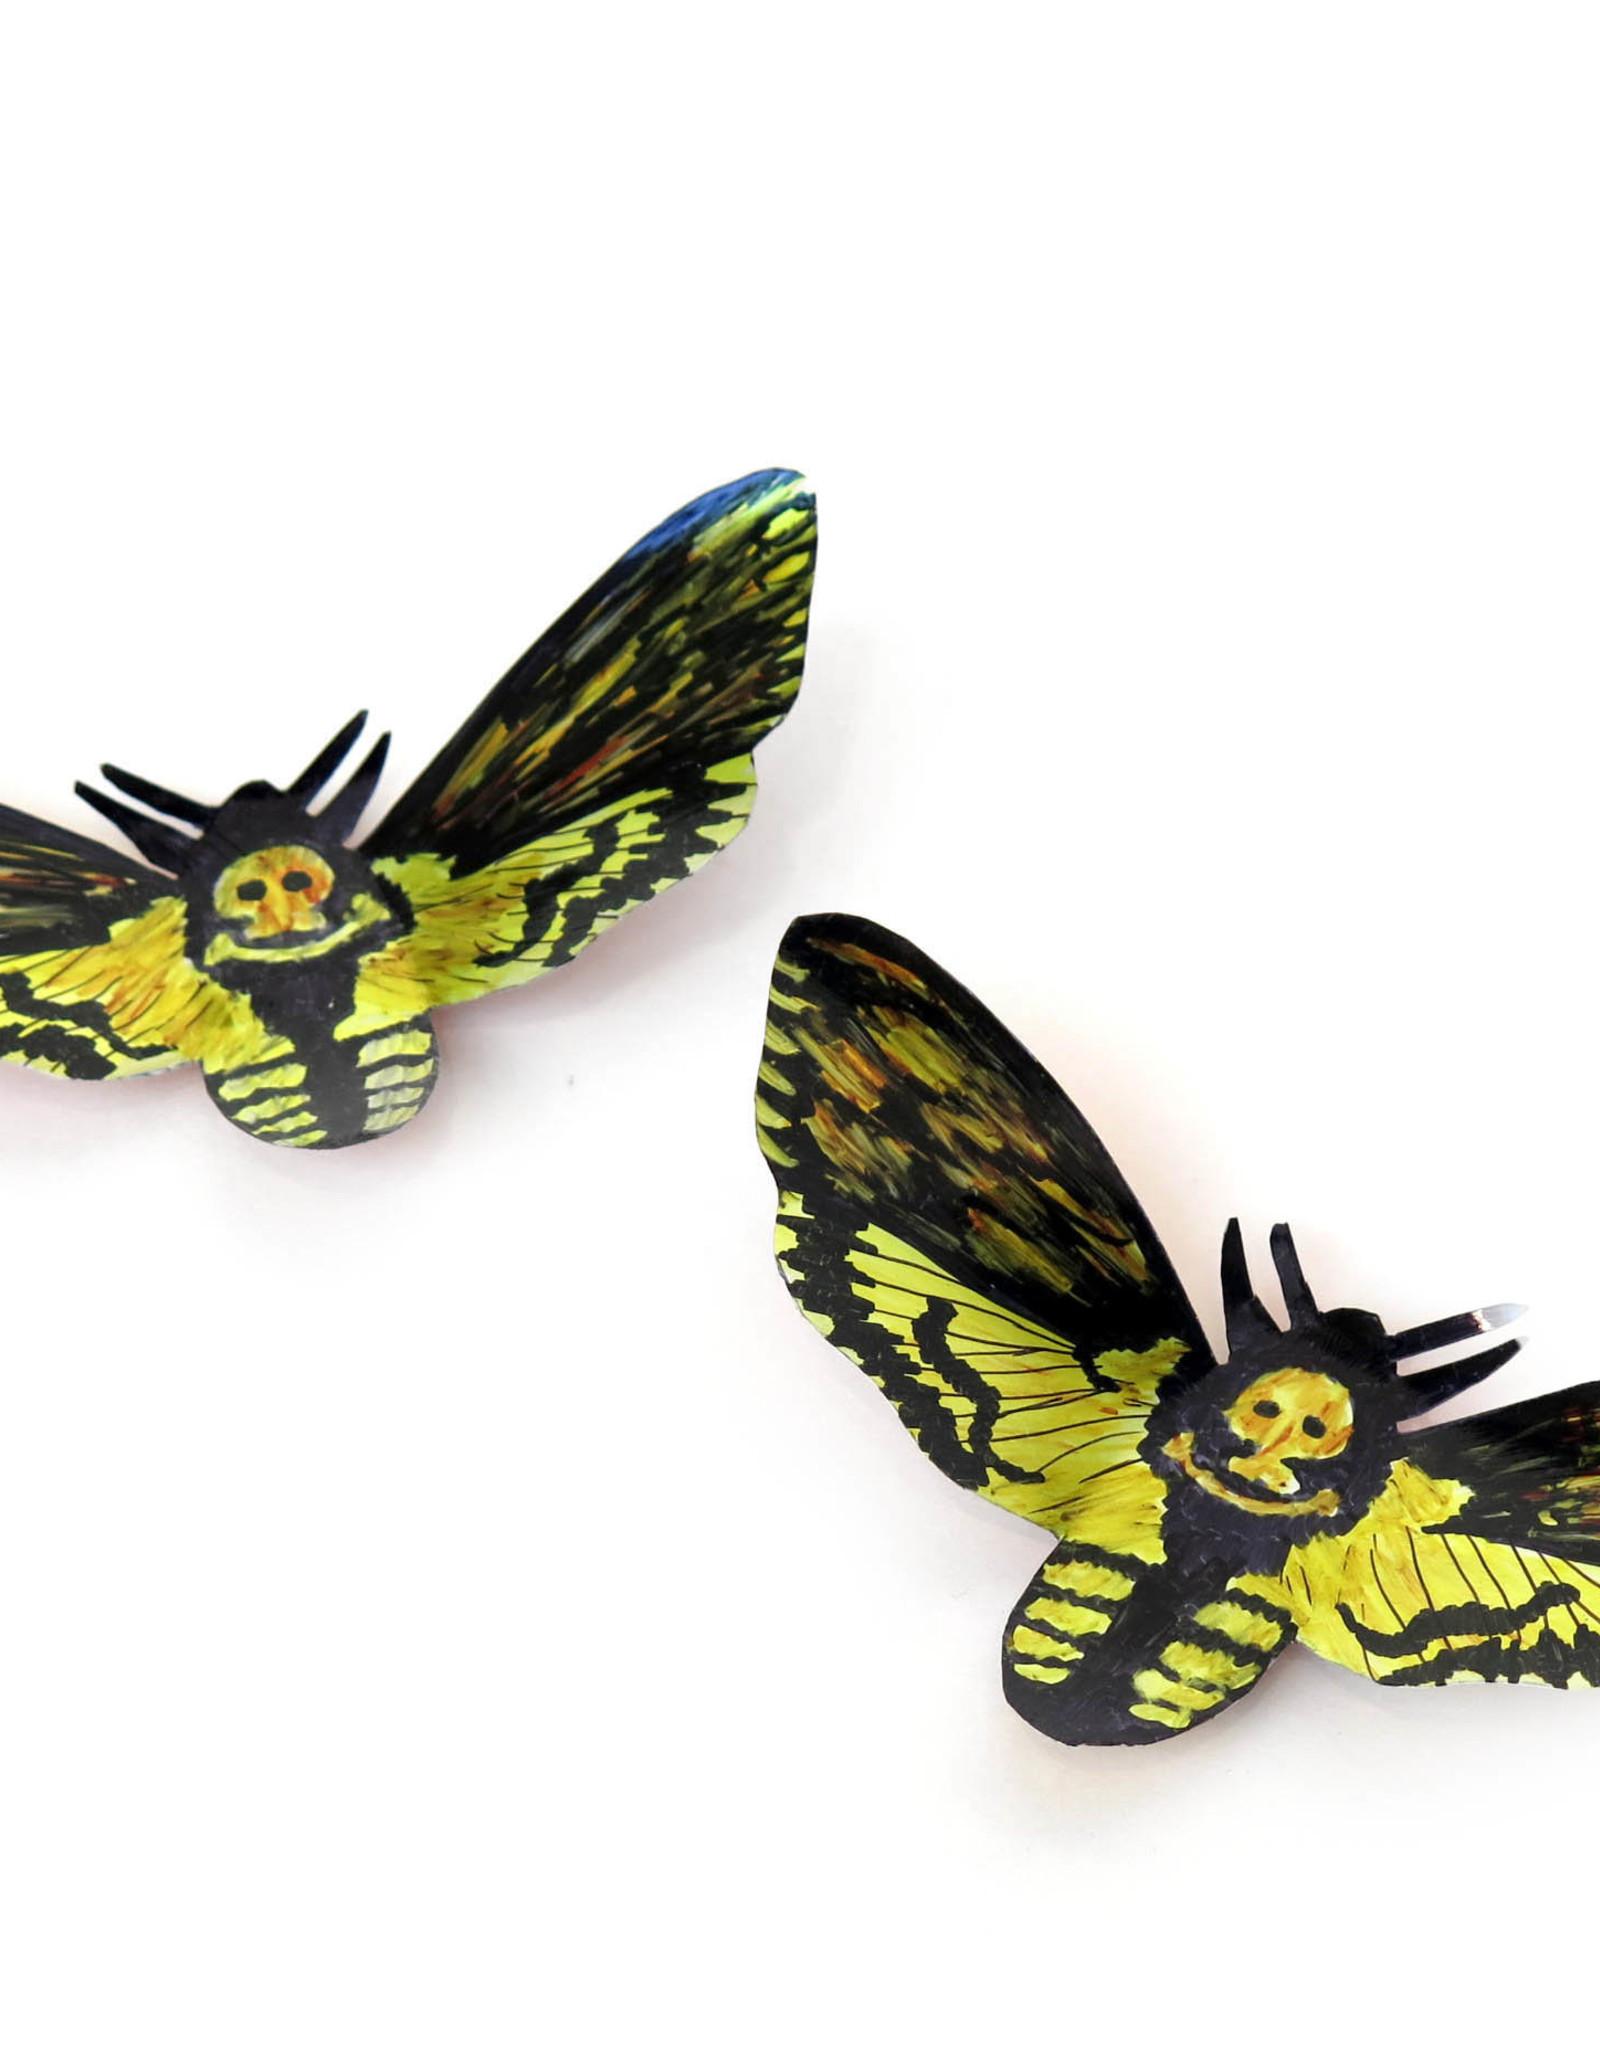 Death's-head Hawkmoth Magnet by Sophia Abel